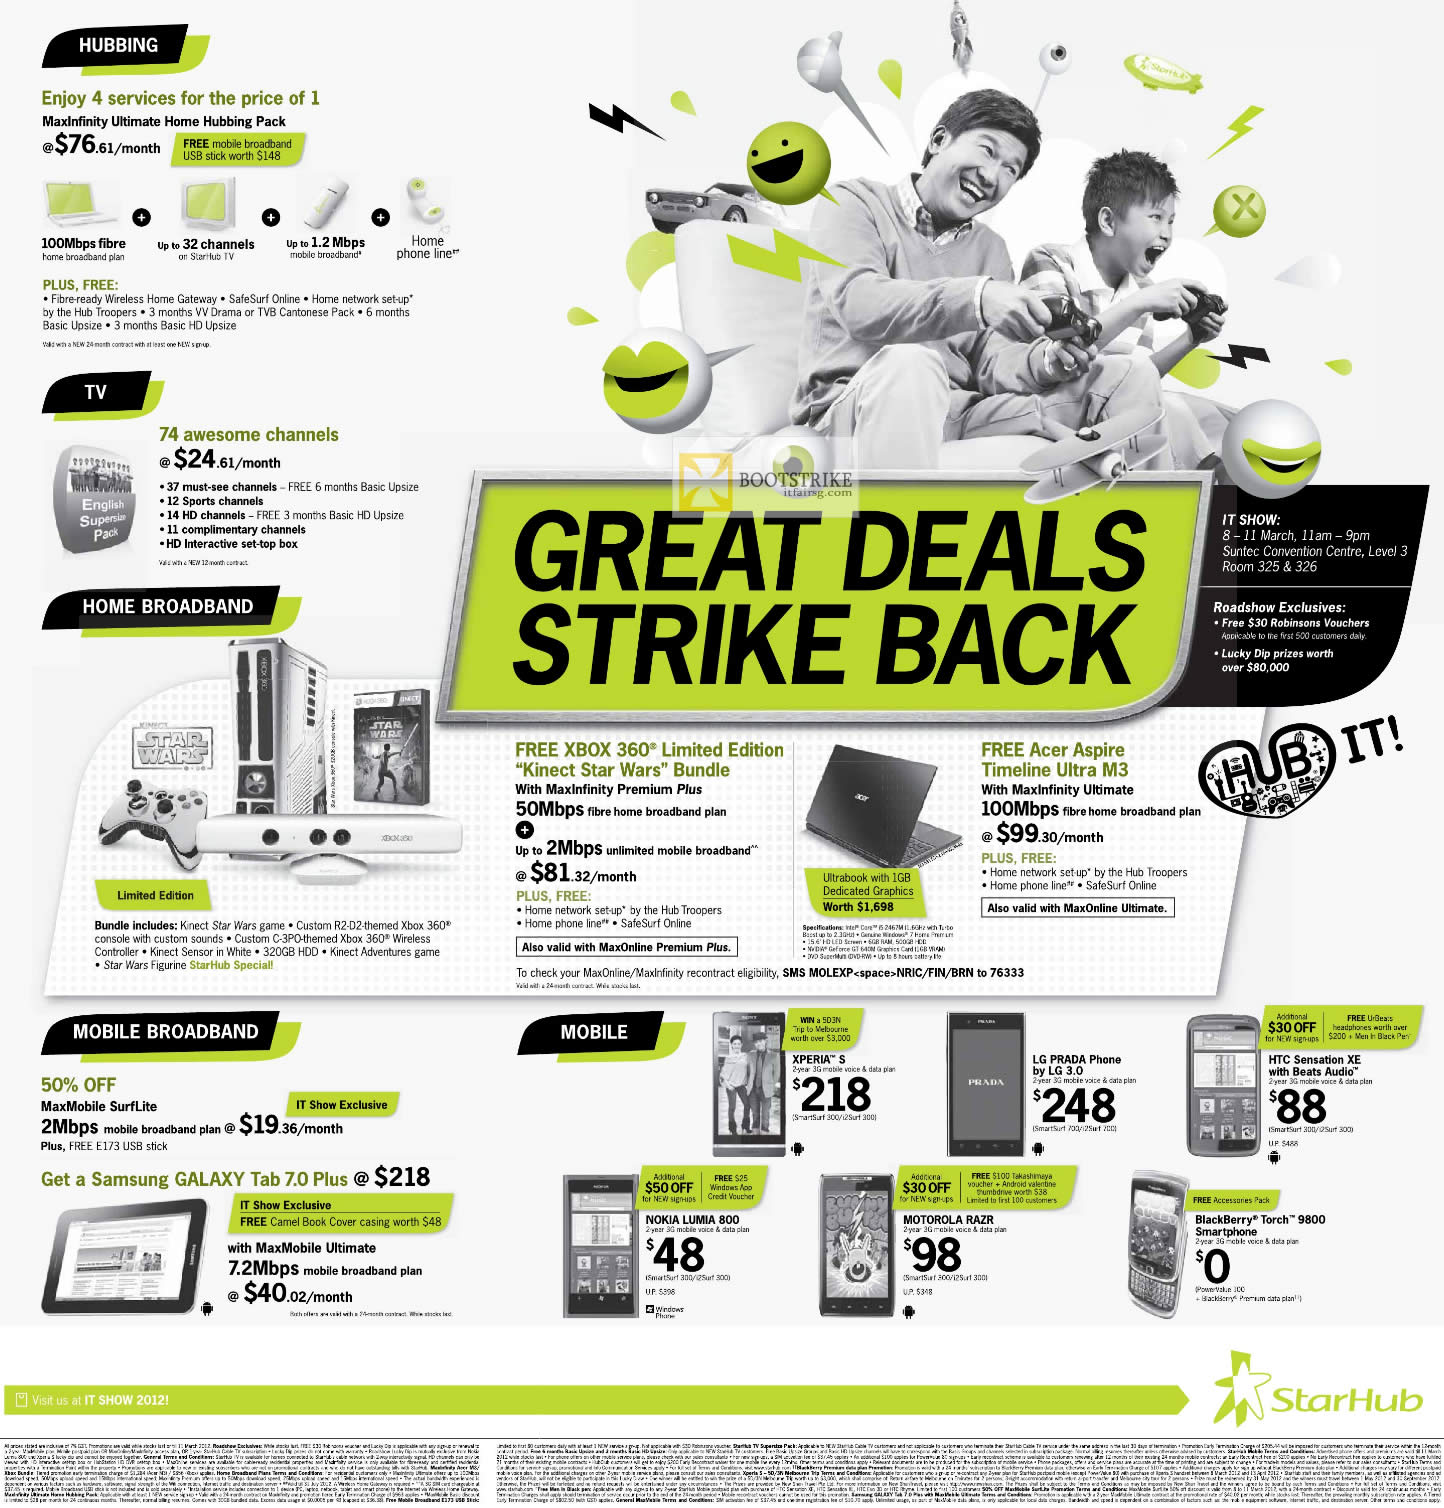 IT SHOW 2012 price list image brochure of Starhub Acer Aspire Timeline Ultra M3, Galaxy Tab 7.0 Plus, Nokia Lumia 800, Xperia S, LG Prada Phone, Motorola Razr, HTC Sensation XE, Blackberry Torch 9800